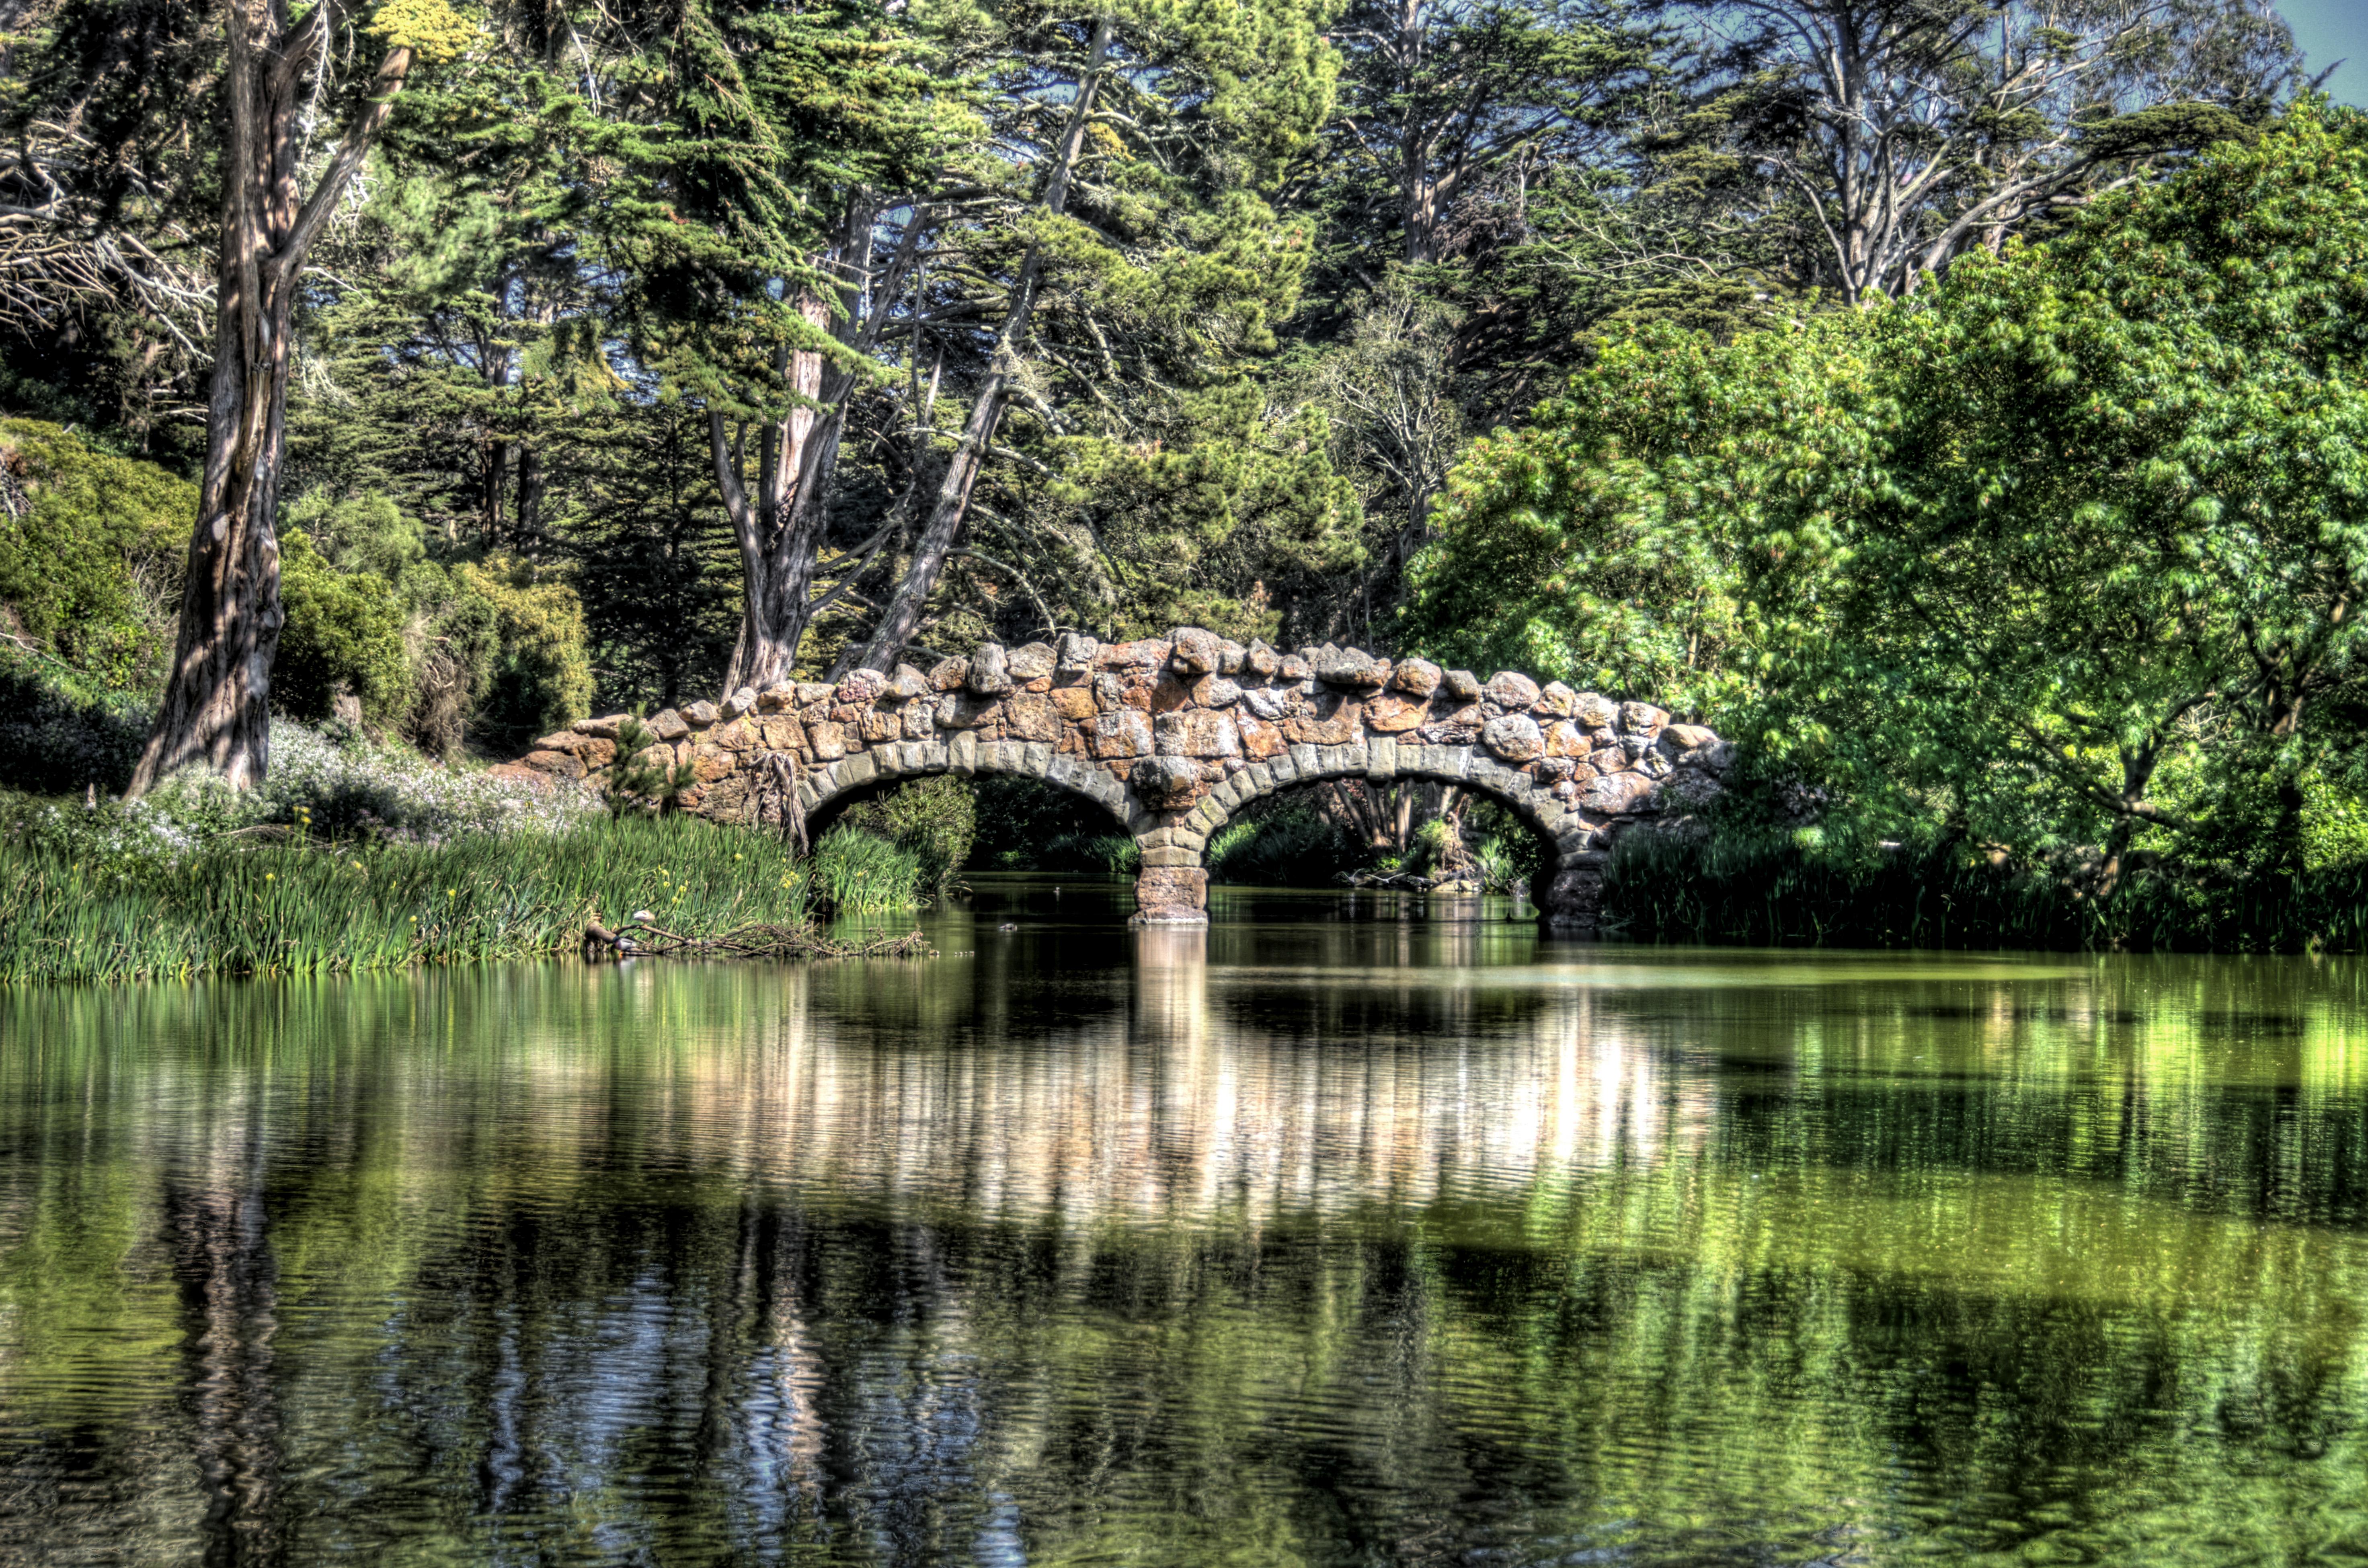 San Francisco Ca Stow Lake Hdr 171 Places 2 Explore